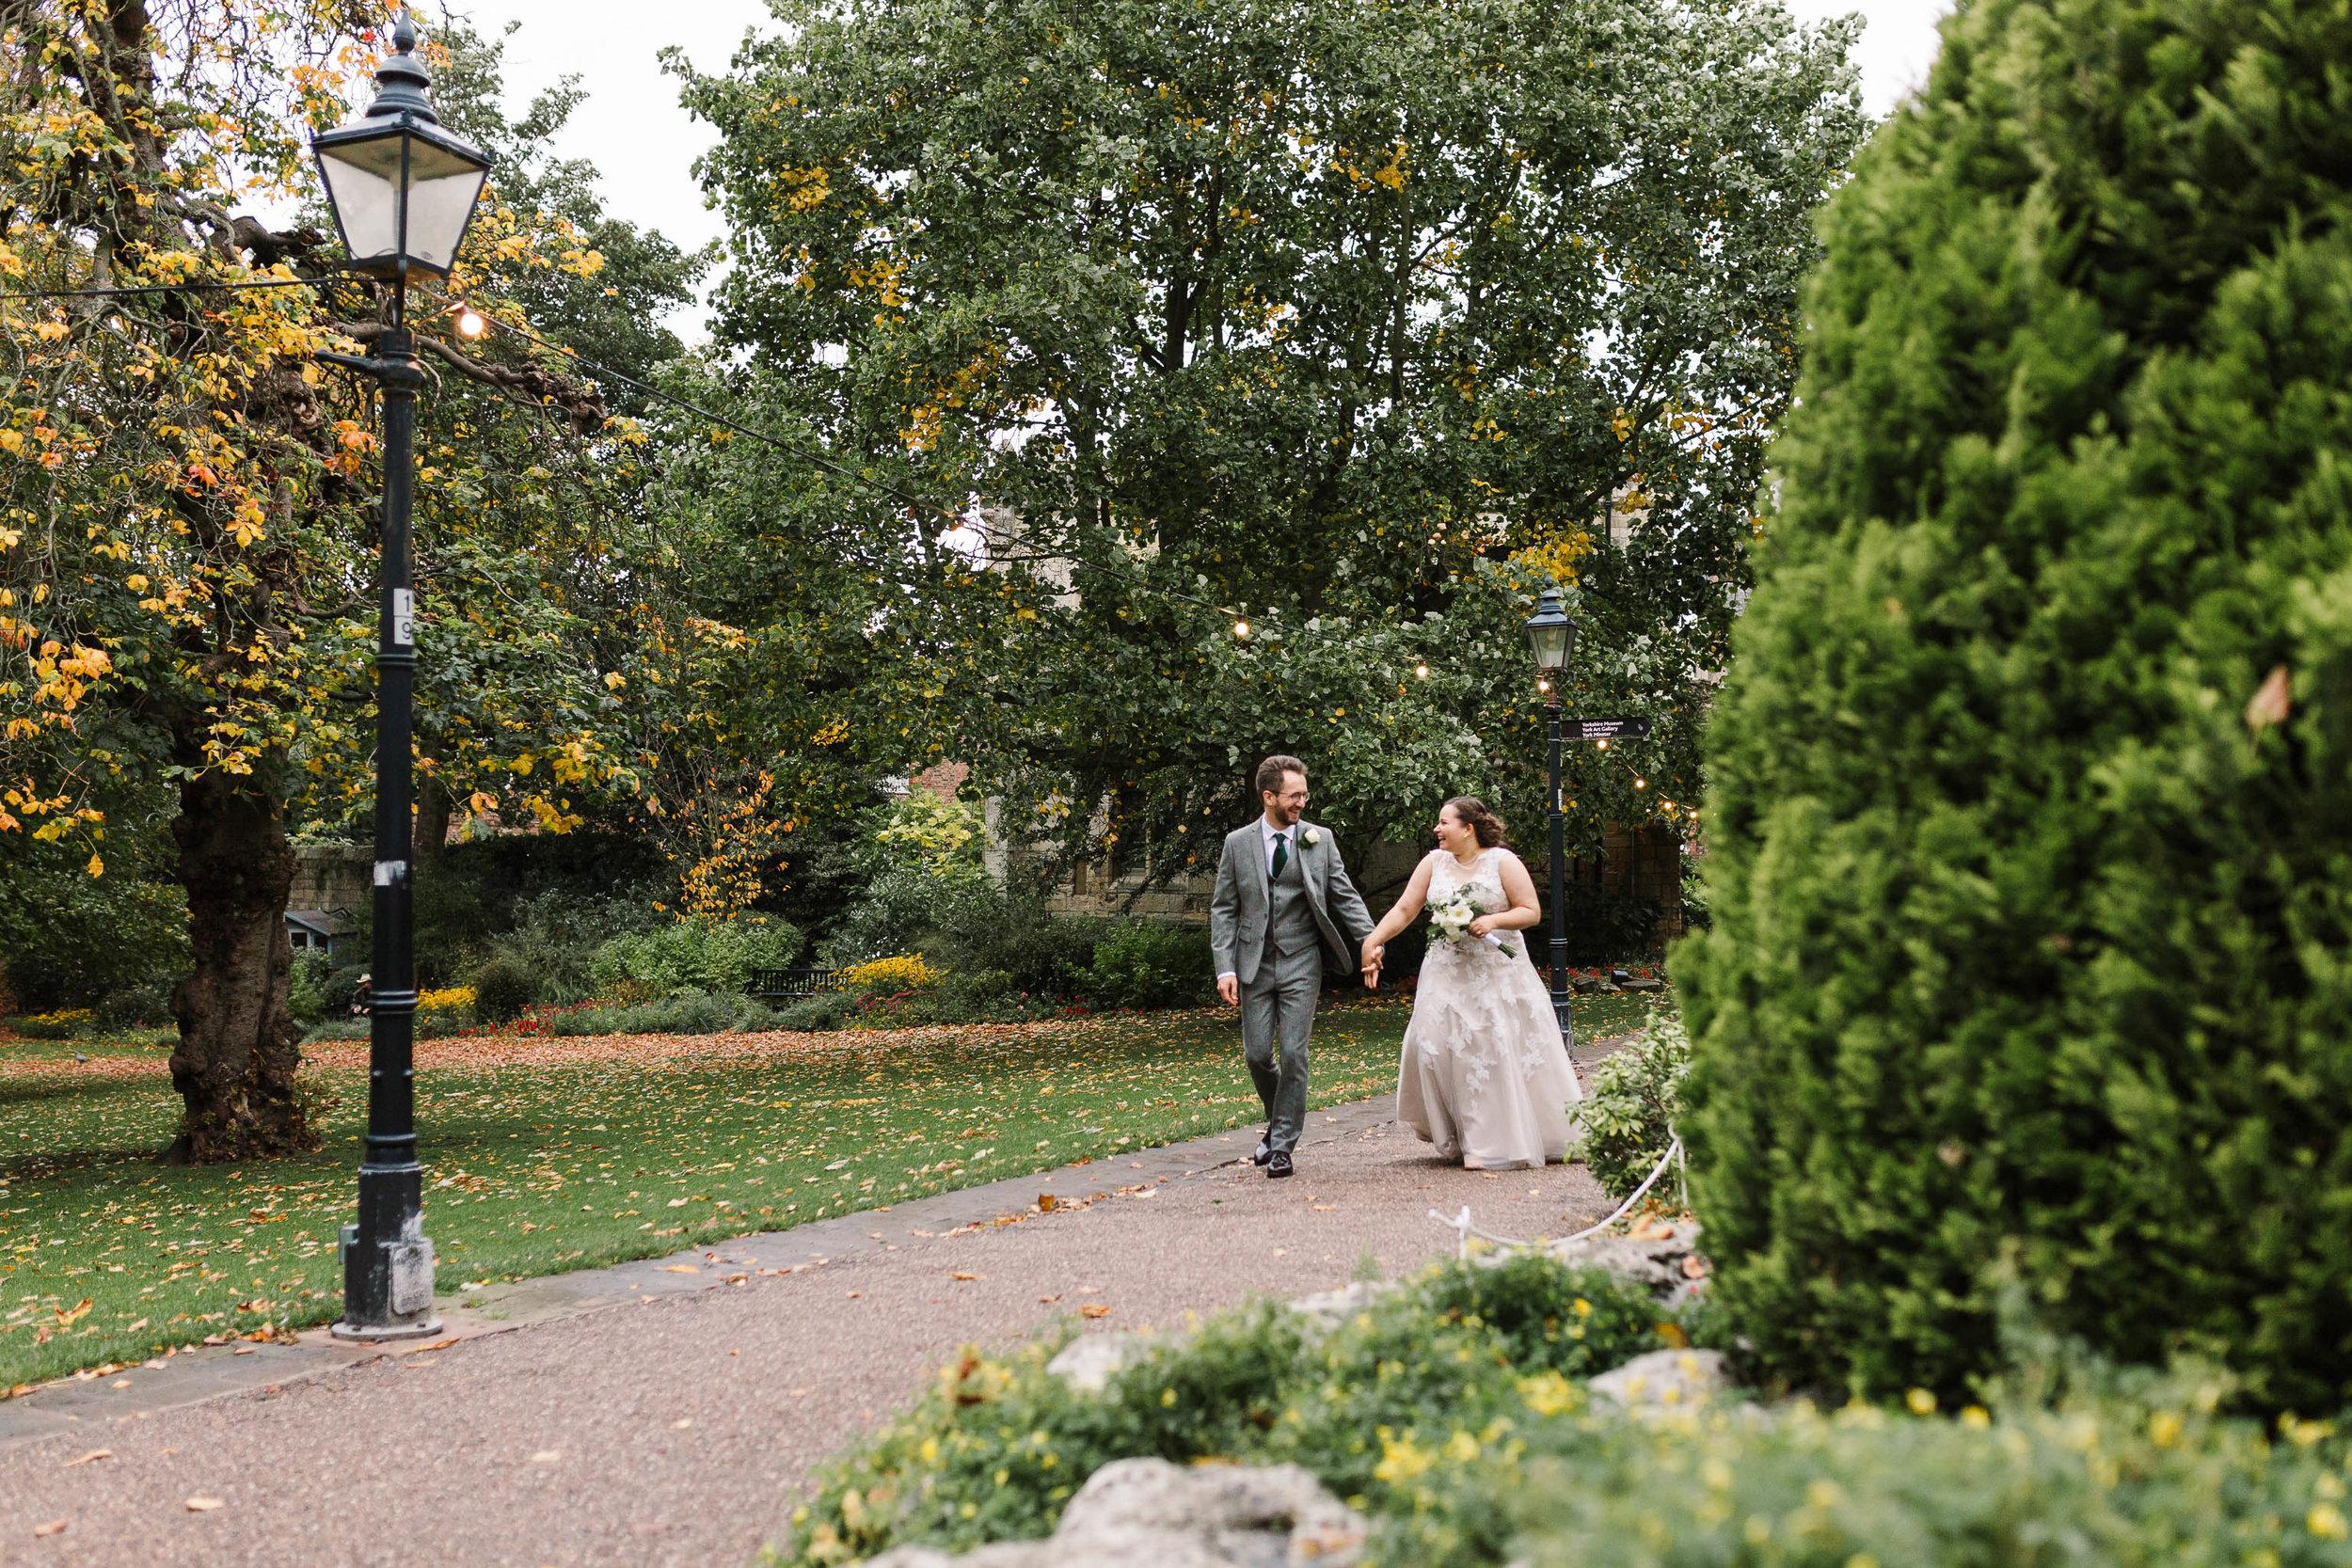 bride and groom walking through museum gardens in york